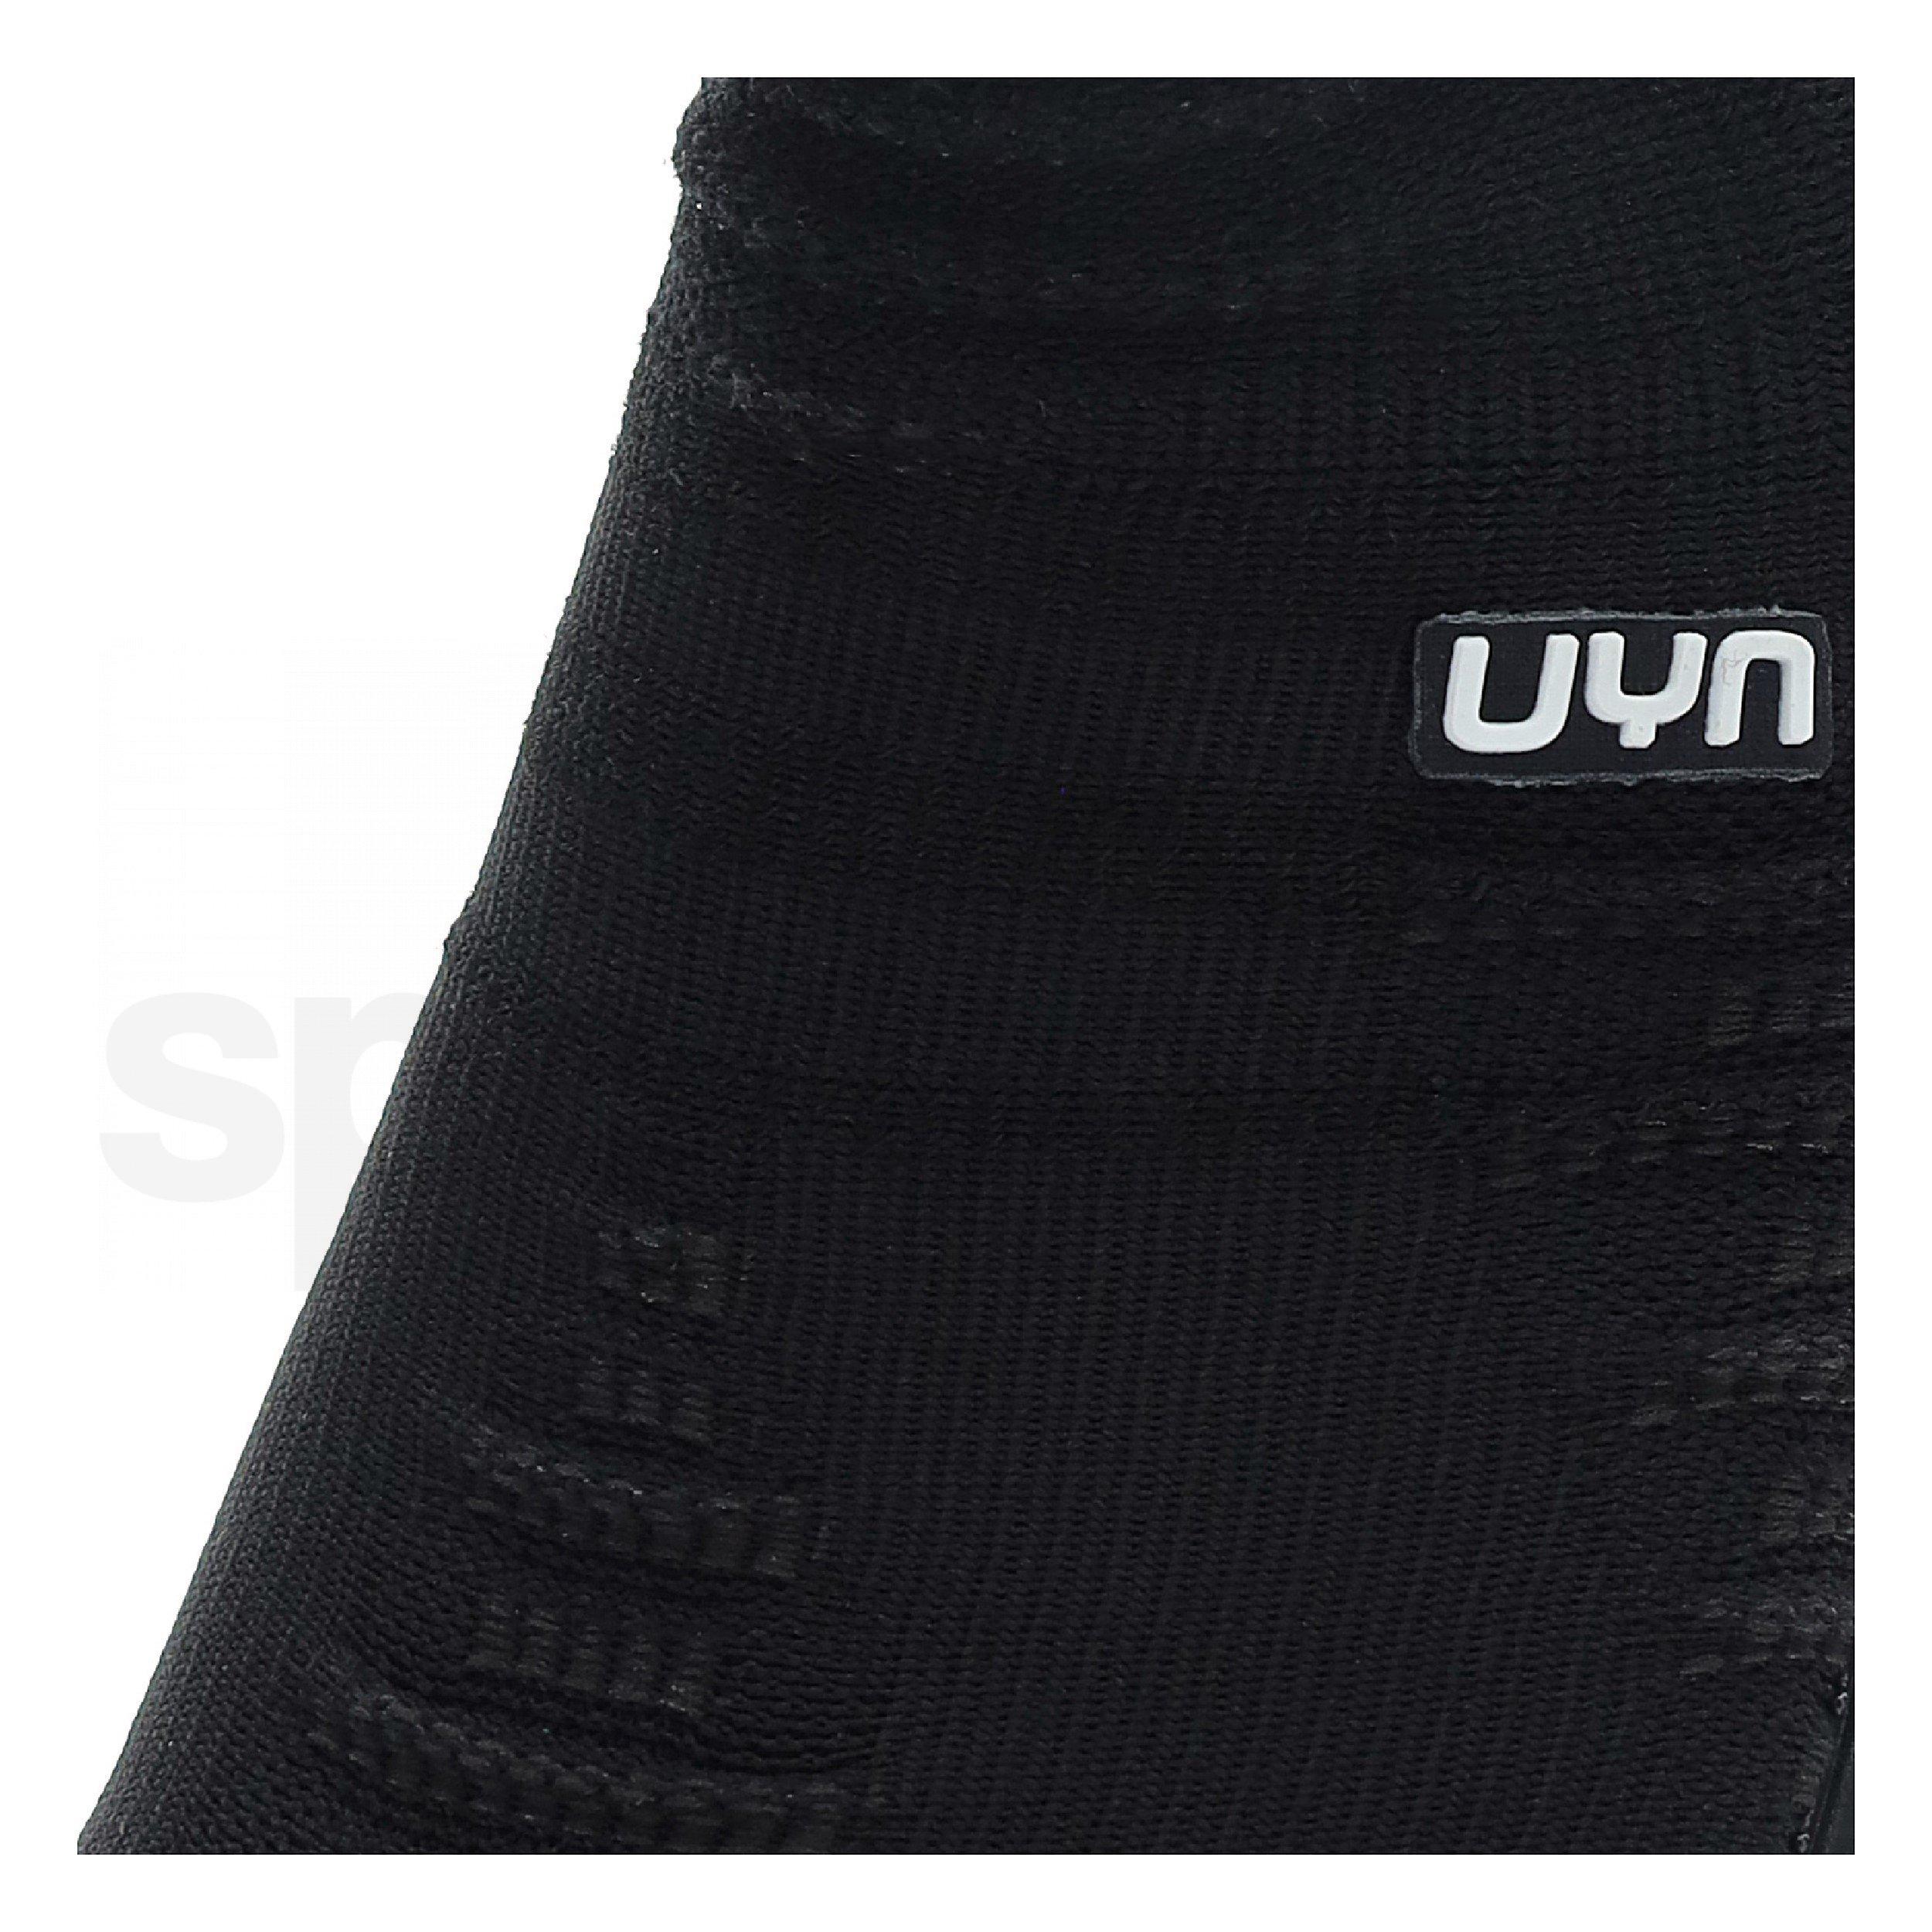 Obuv UYN X-Cross Shoes Black Sole M - černá